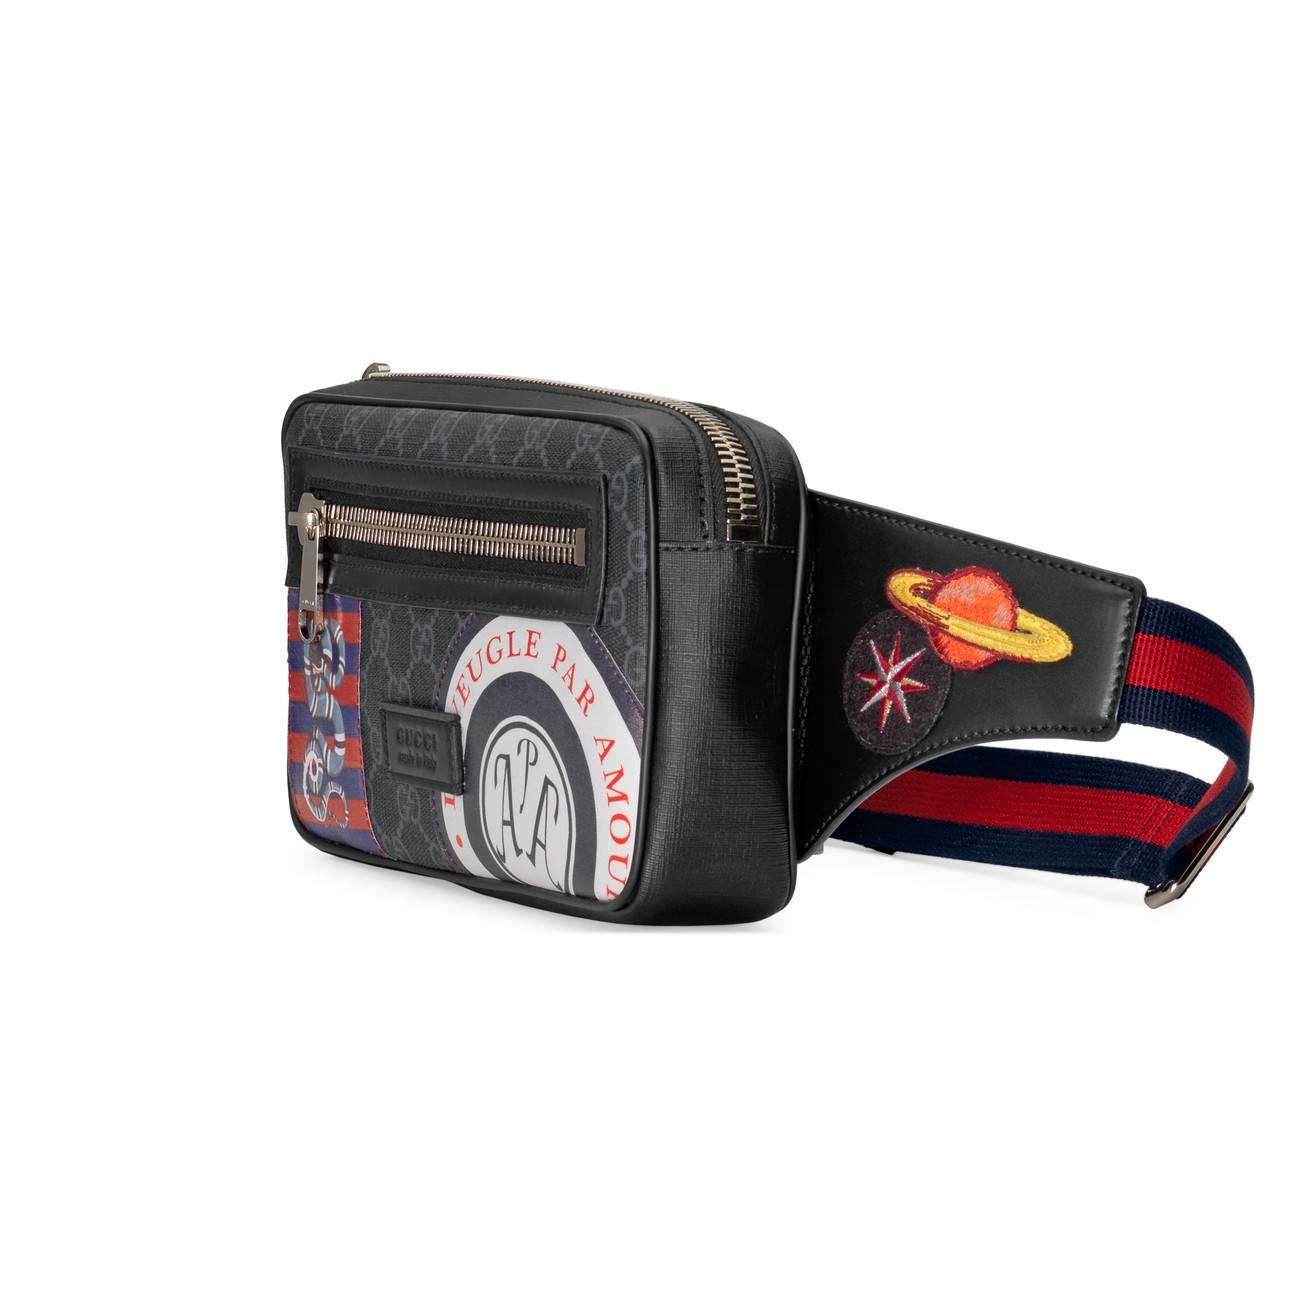 0fa904522773c4 Gucci Night Courrier Soft GG Supreme Belt Bag in Black for Men - Lyst